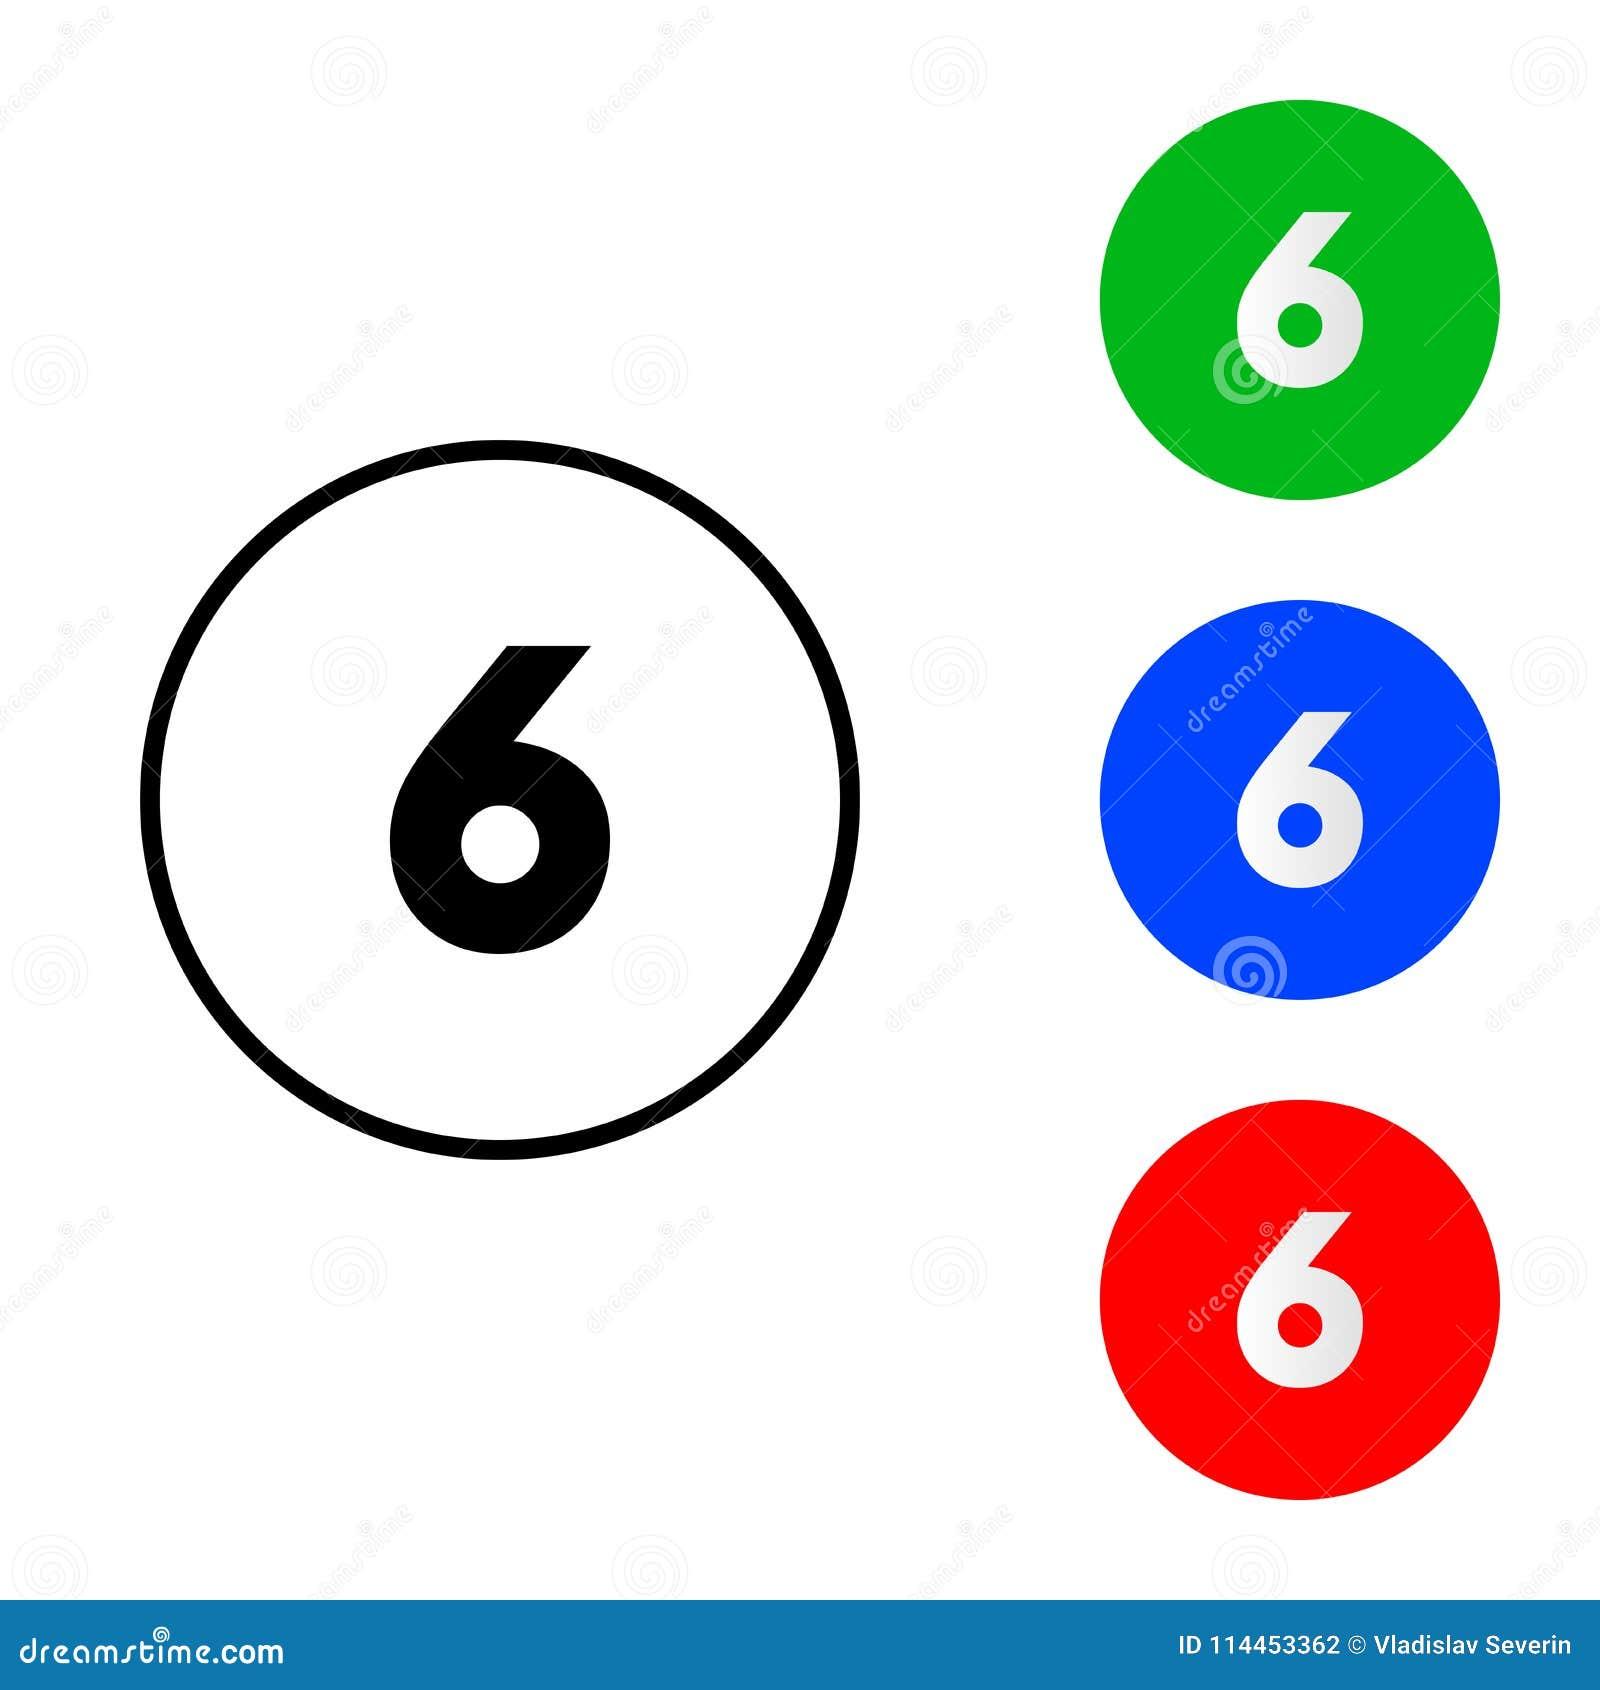 Nummer 6 pictogram